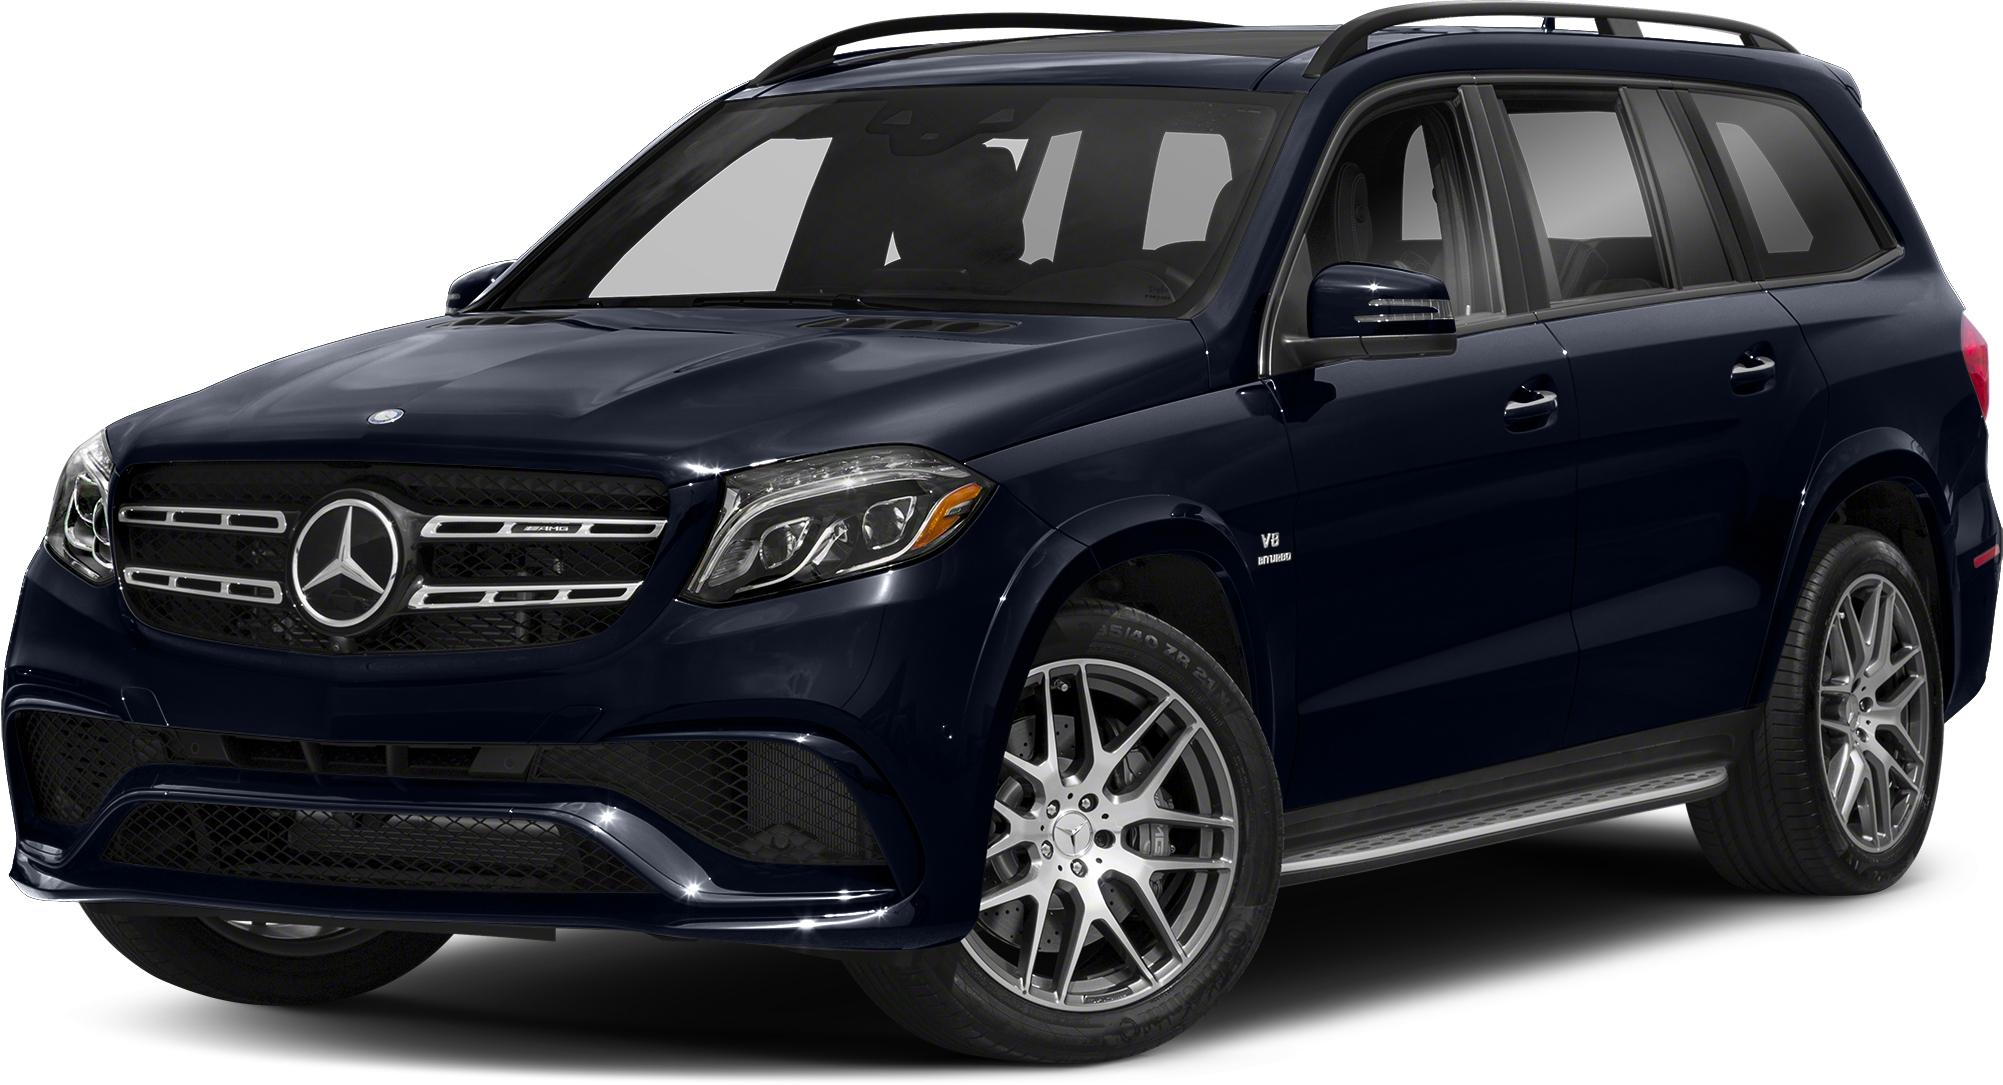 Mercedes Gls Amg >> 2019 Mercedes Benz Gls Amg 63 Suv